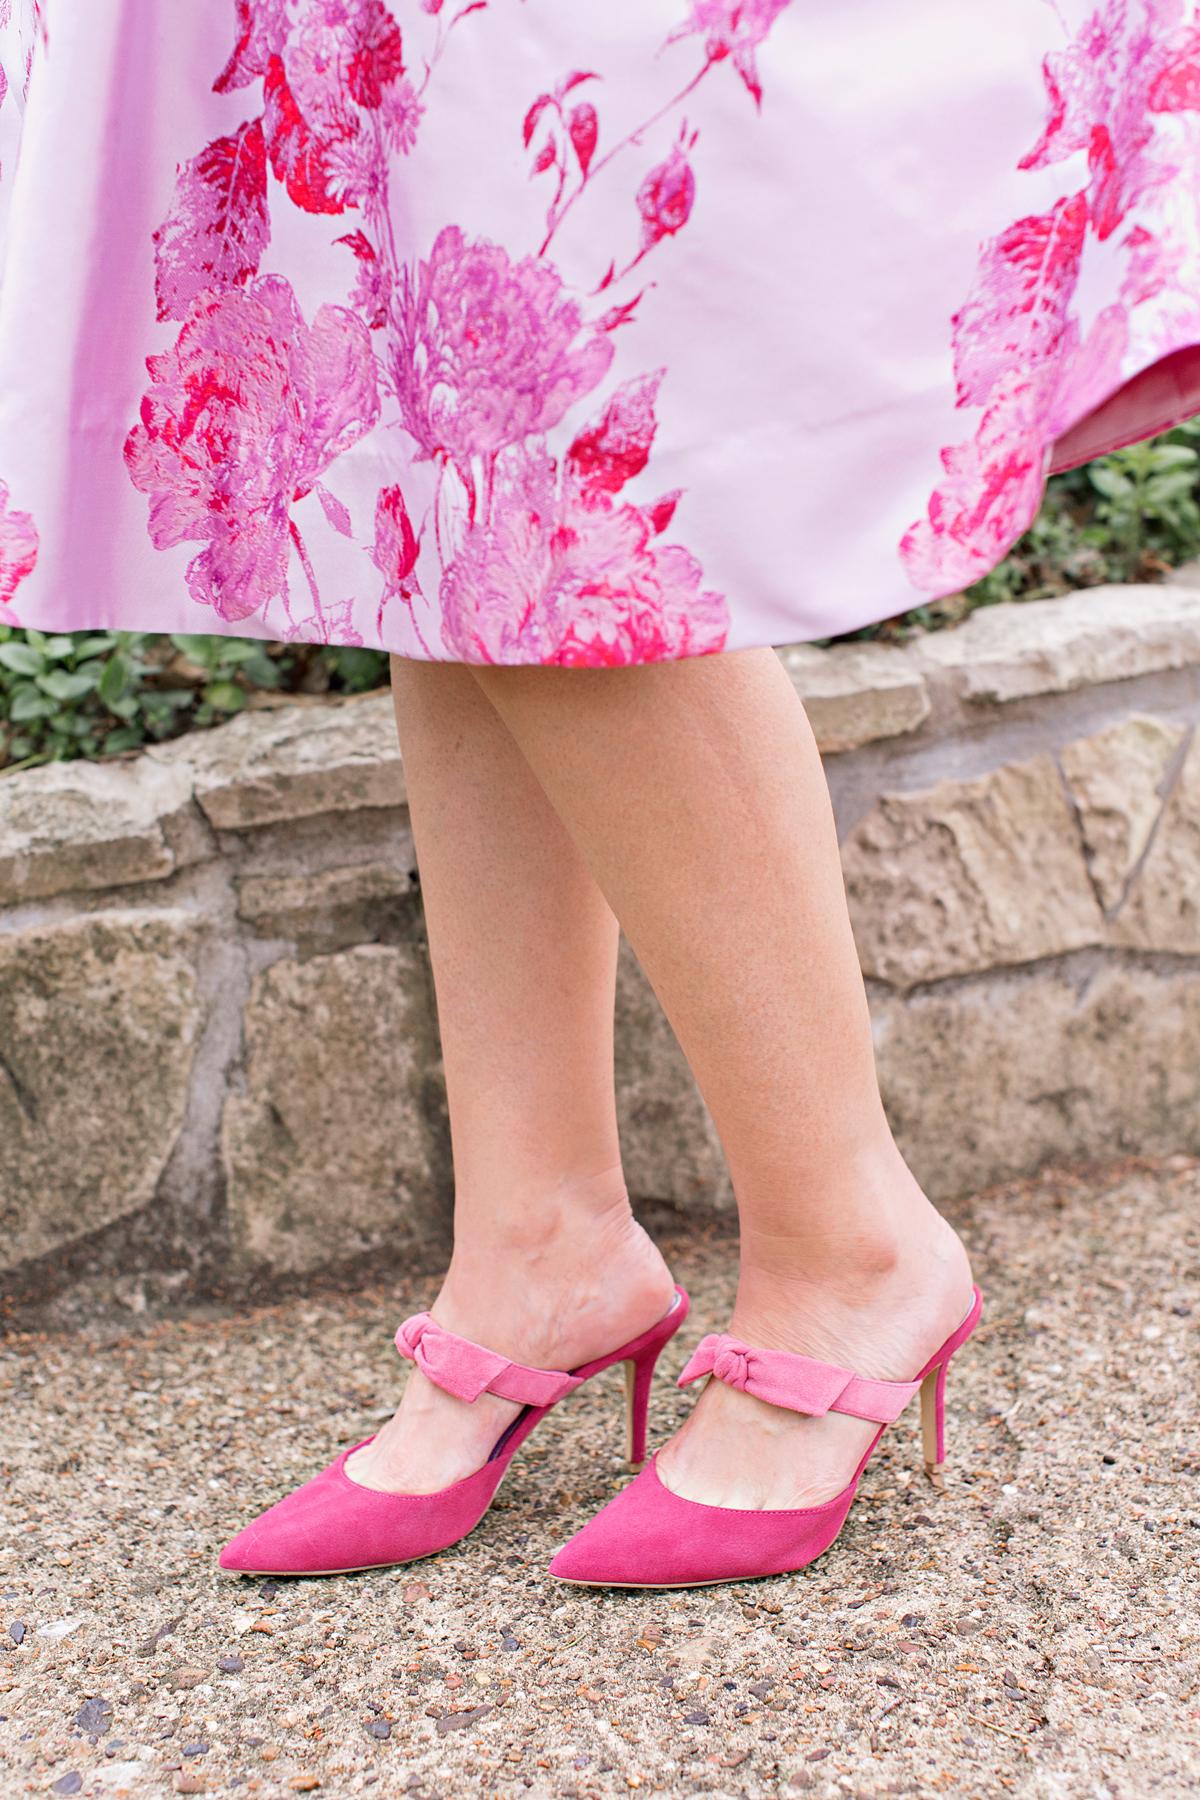 Pink dress, jacquard dress, special occasion dress, easter dress, fit and flare dress, fit and flare special occasion dress, pink jacquard dress, pink special occasion dress, pink fit and flare dress, white house black market pink dress, whbm dress, whbm dresses, sleeveless floral jacquard dress, sleeveless floral dress, sleeveless fit and flare dress, suede bow mules, bow mules, pink mules, pink bow mules, whbm suede bow mules, white house black market suede bow mules, three quarter-sleeve cardigan, pink cardigan, whbm cardigan, empty nest, empty nester, empty nesters, fashion over 50, midlife fashion, over 50 fashion, style over 50, style over 40, fashion over 40, midlife style, over 50 style